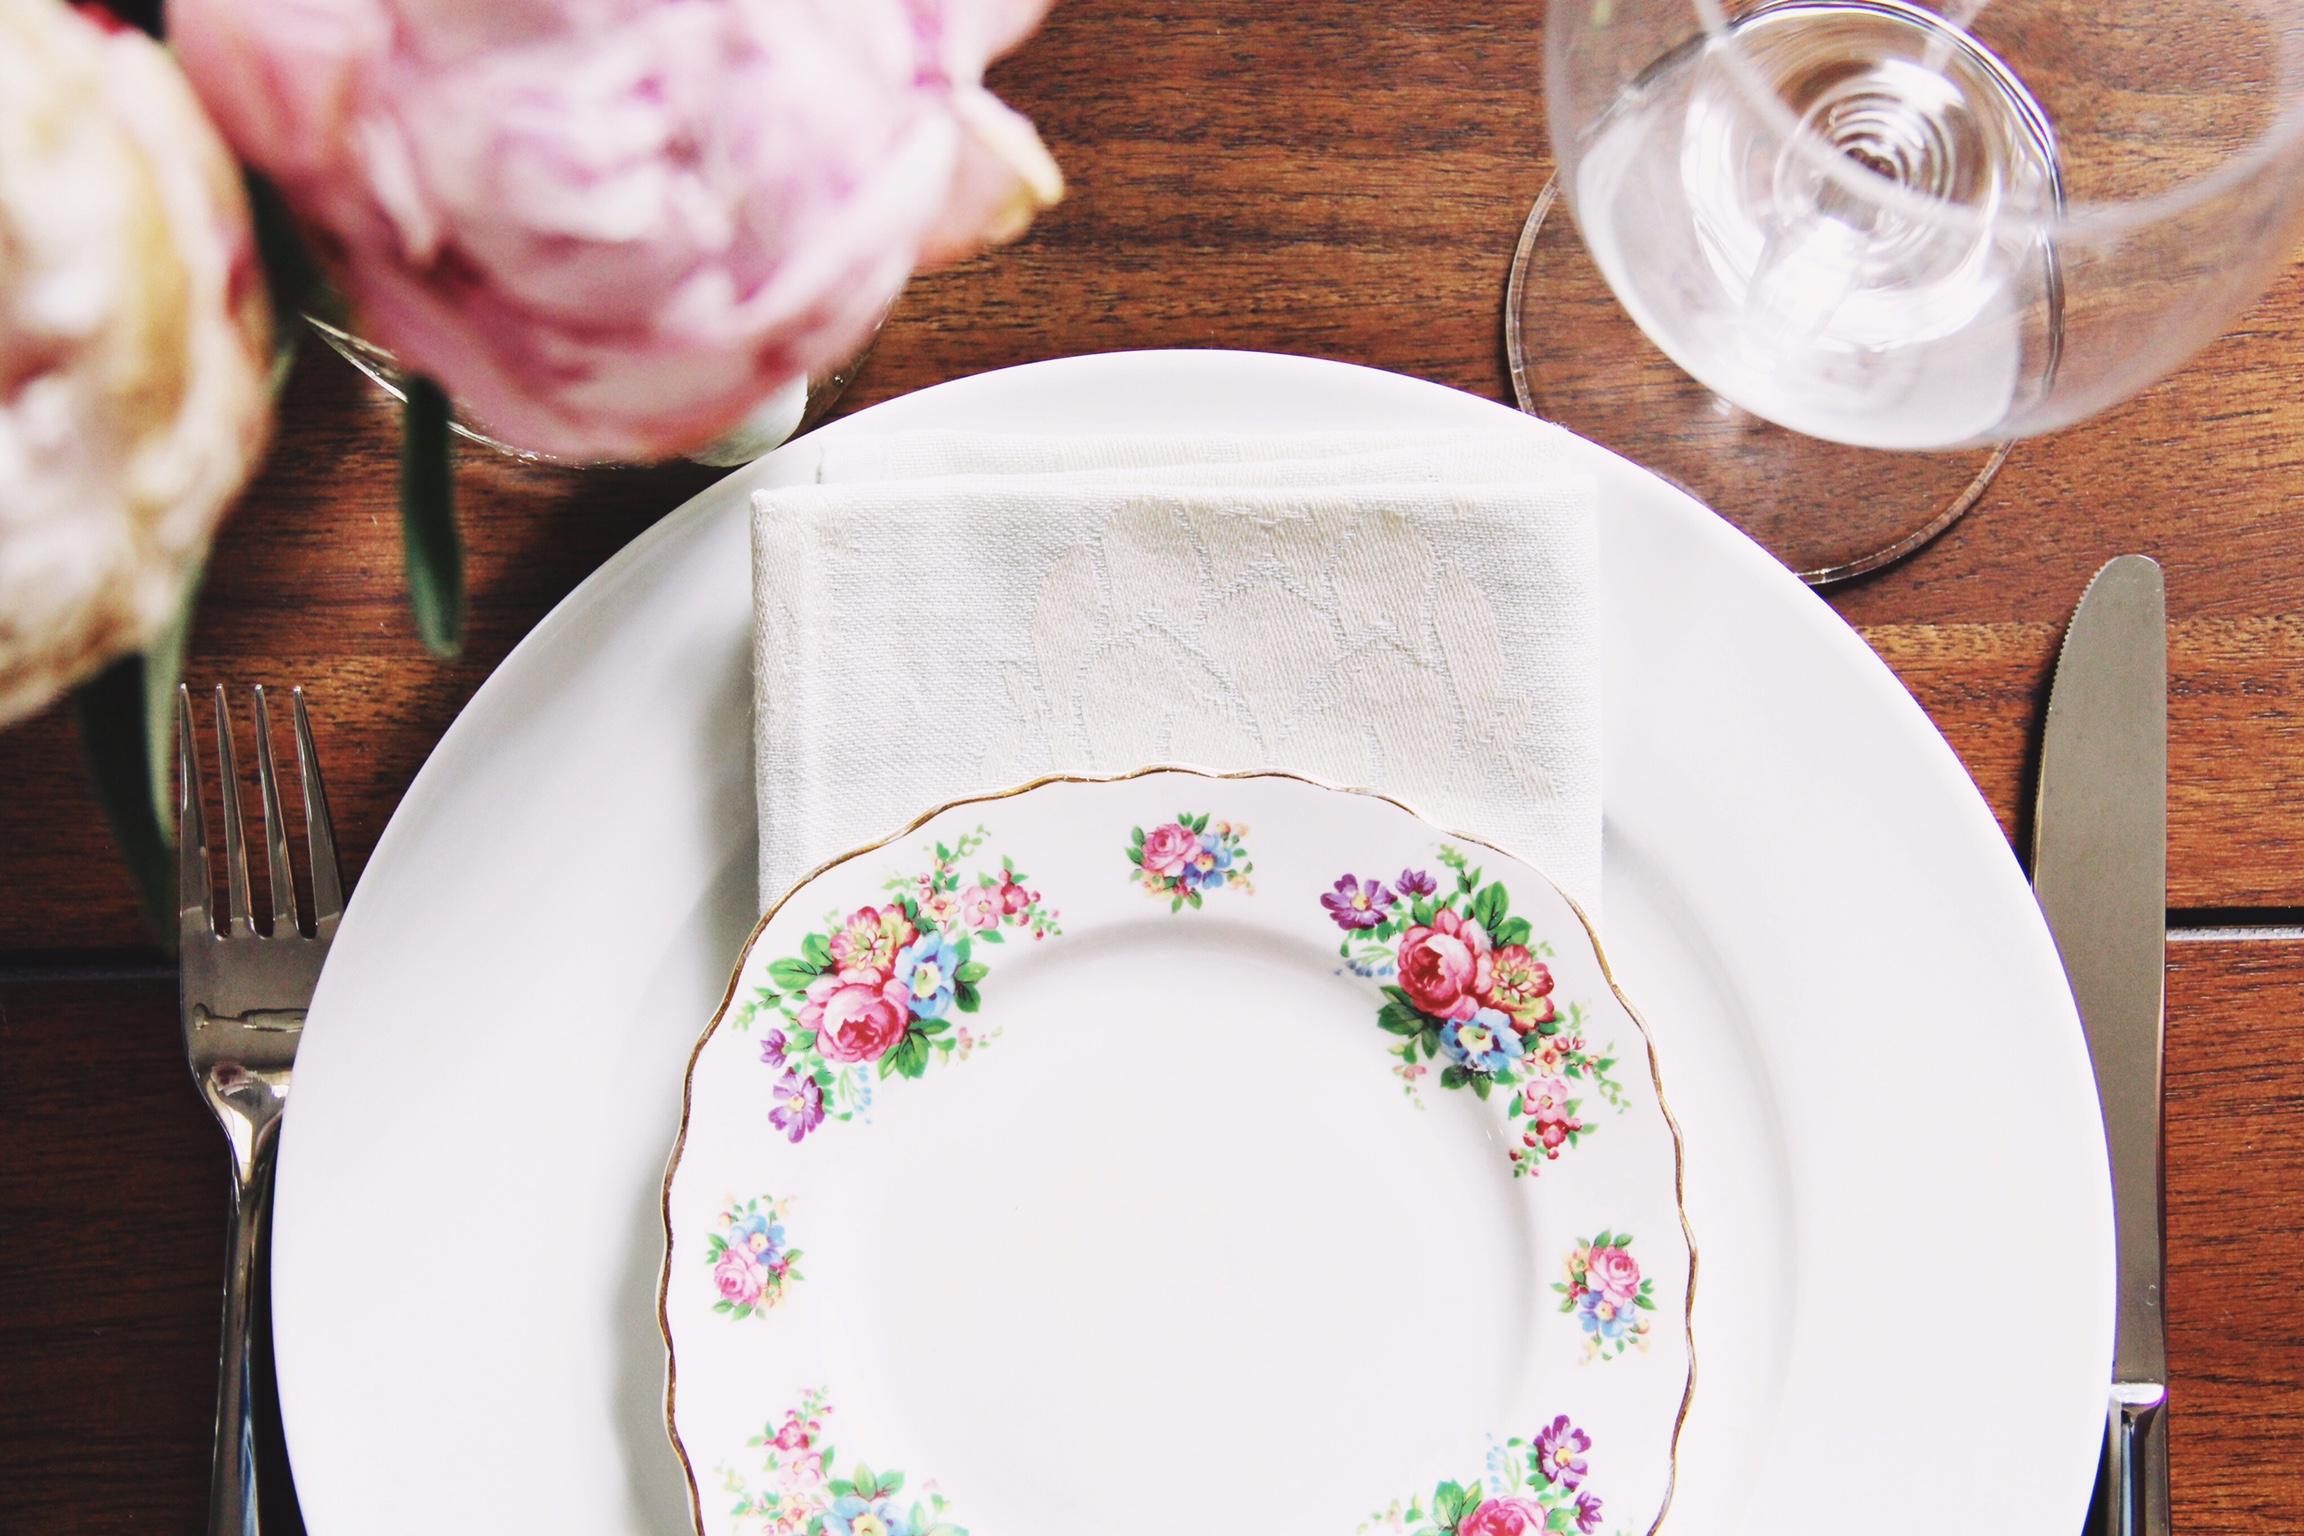 French farm tablescape for brunch - The Pastiche